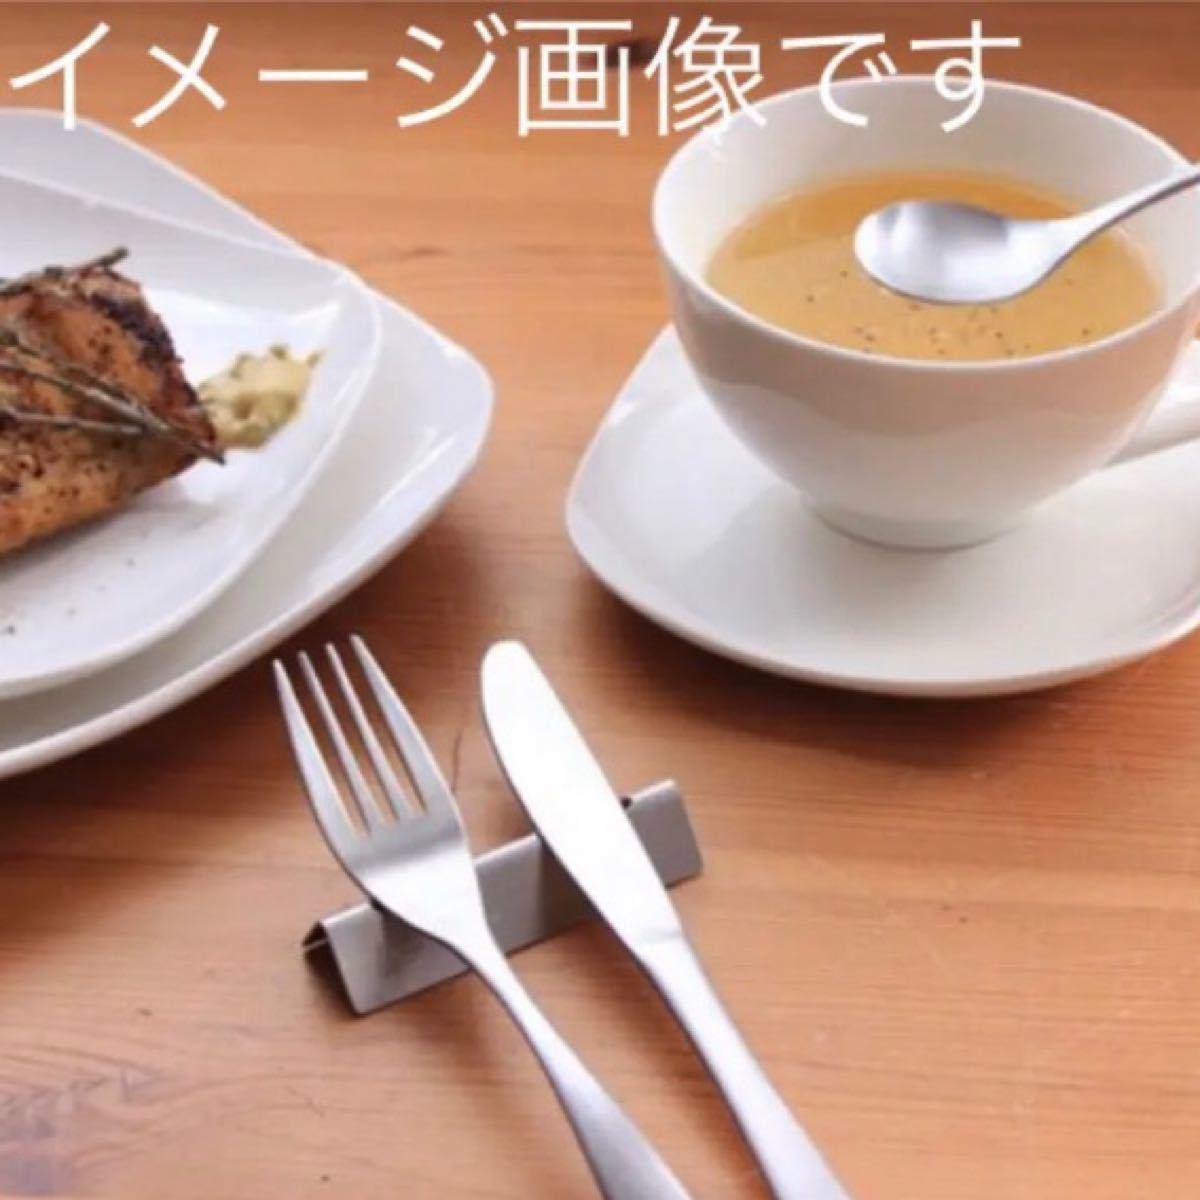 Made in TSUBAME カトラリーレスト 4個セット 新品 日本製 新潟県燕市燕三条